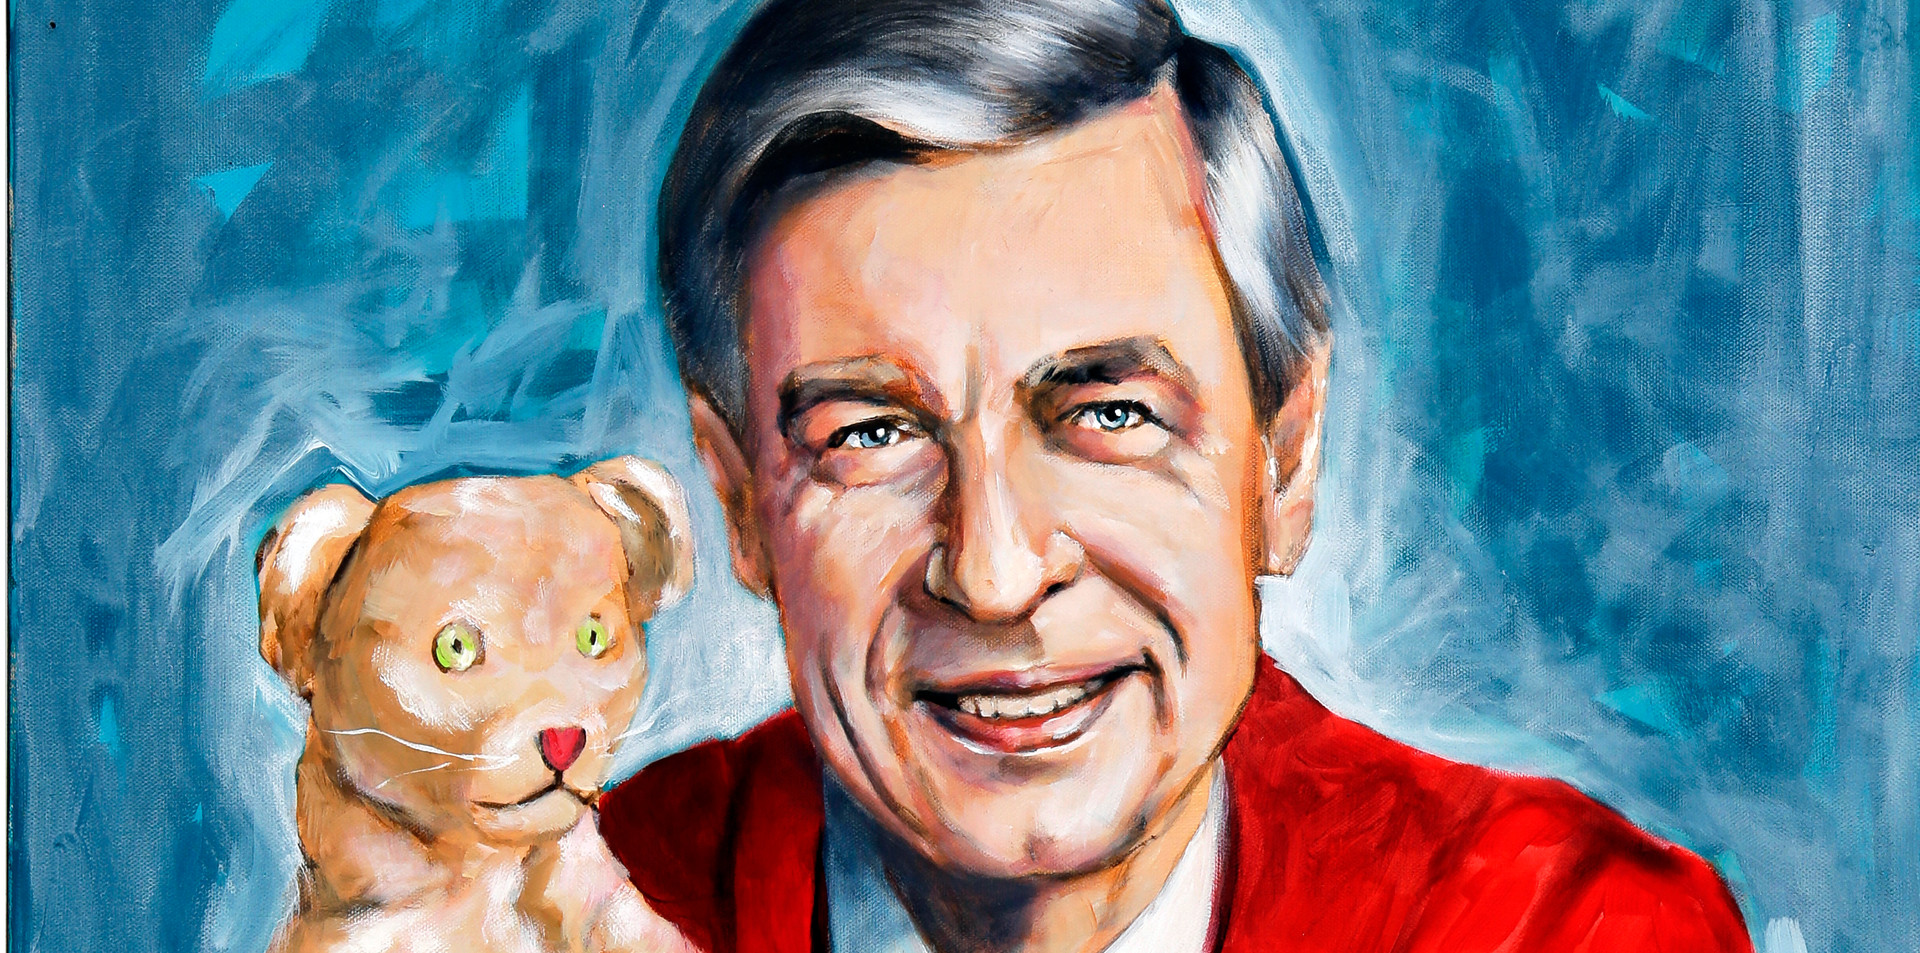 The Lovely Mister Rogers